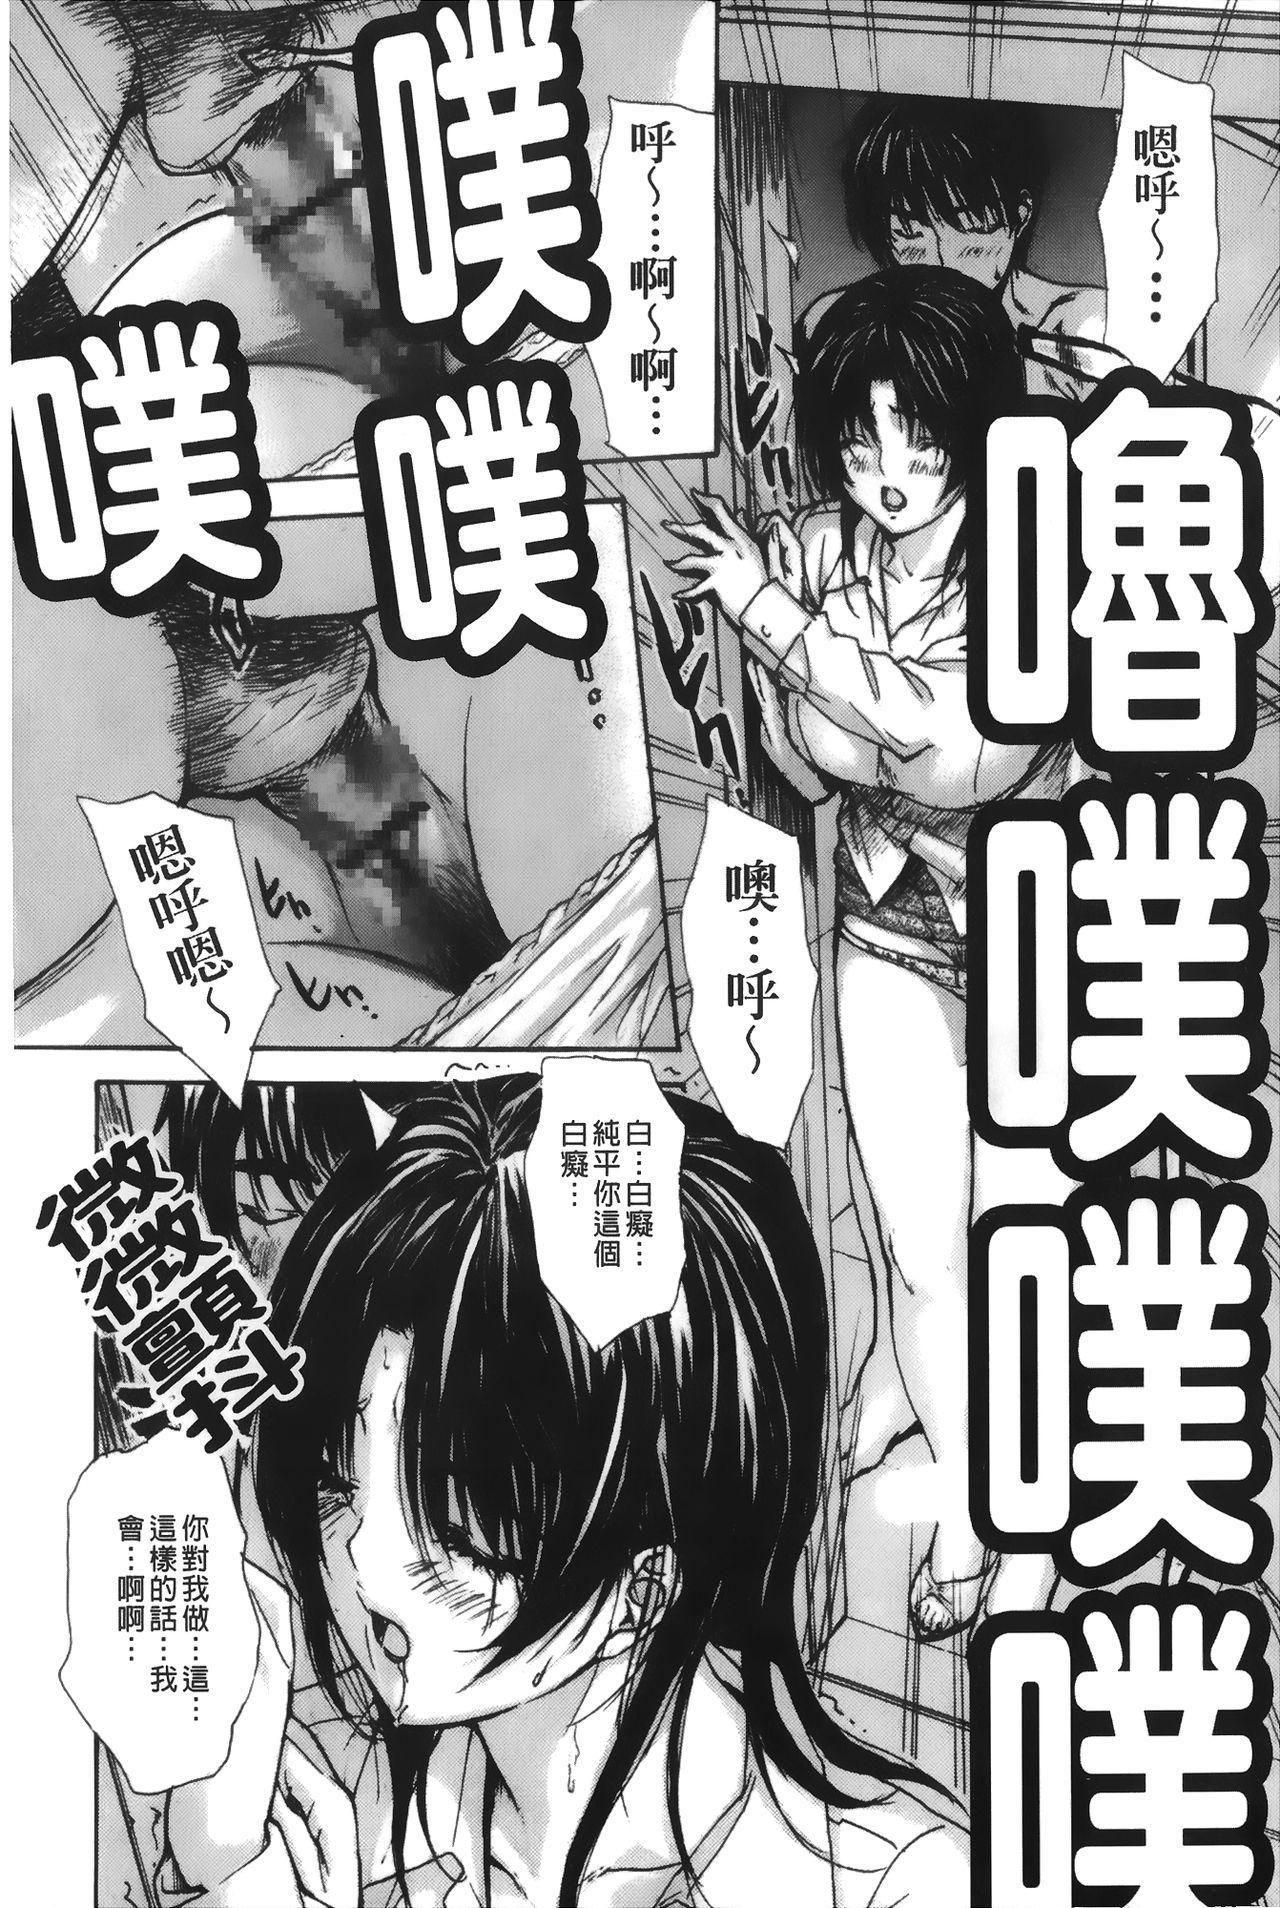 Tonari no Minano Sensei 4 | 隔壁的美奈乃老師 4 163